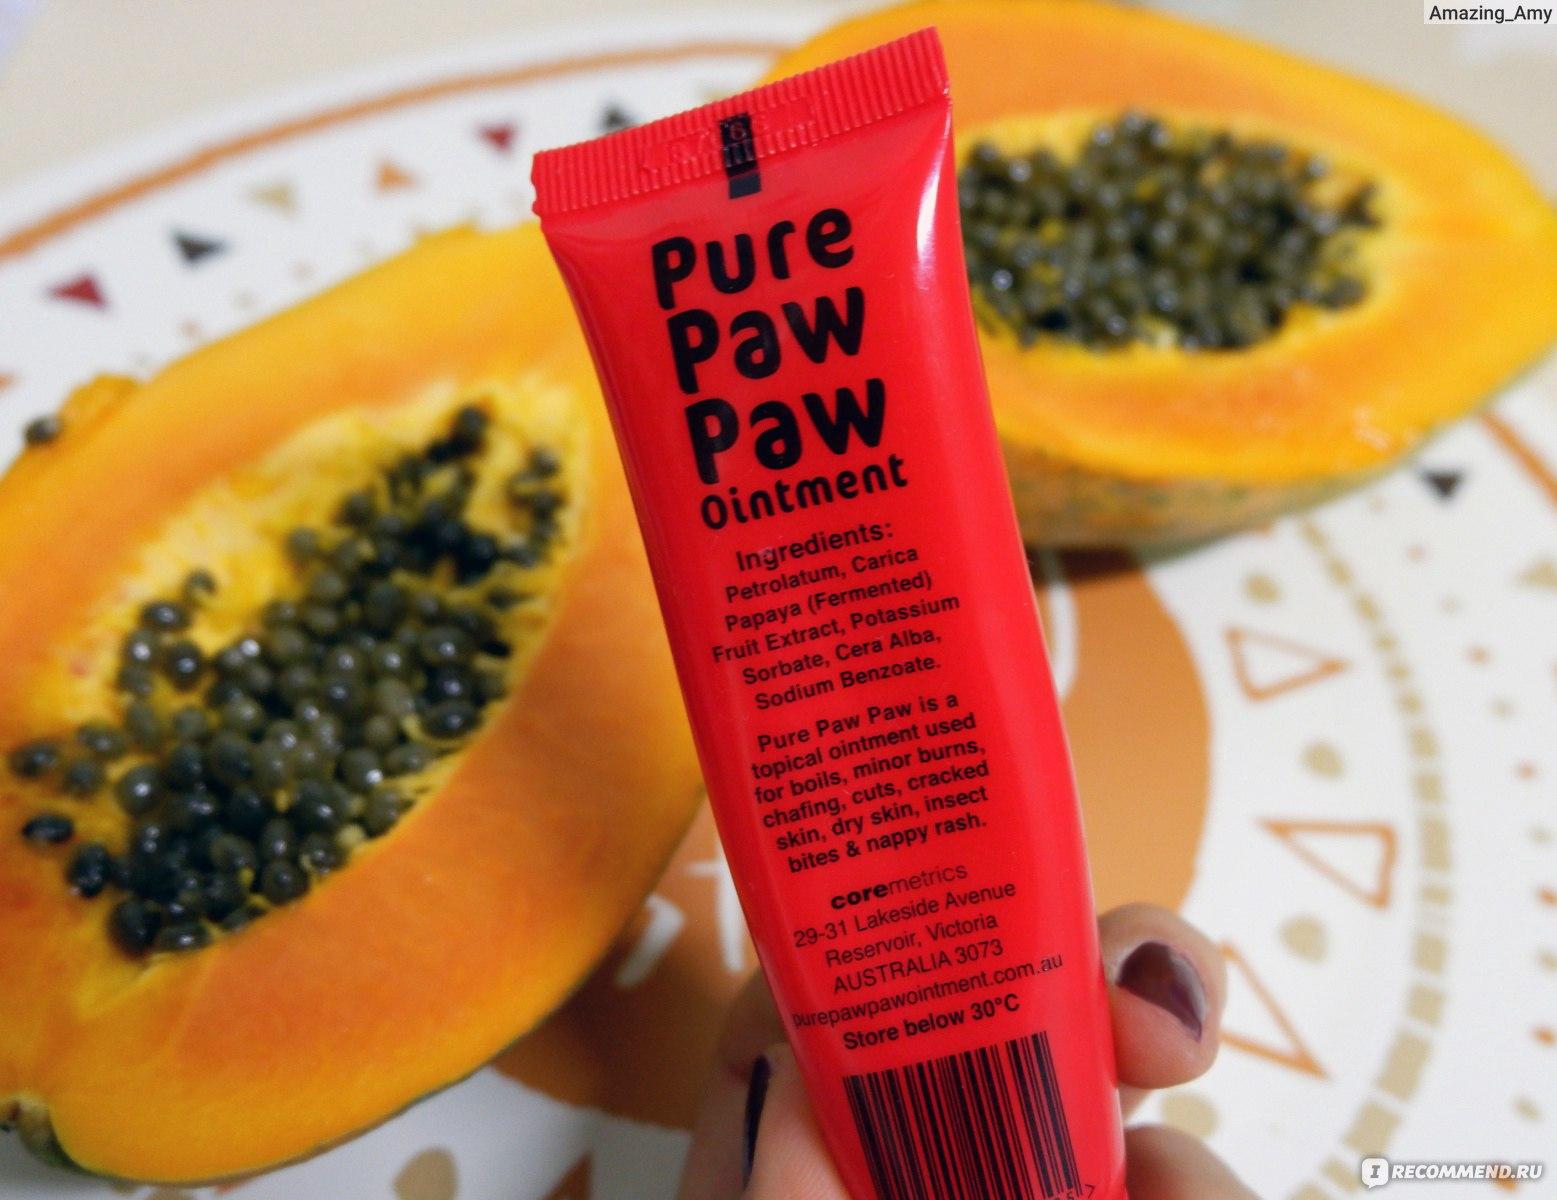 Pure Paw Ointment Original Pawpaw